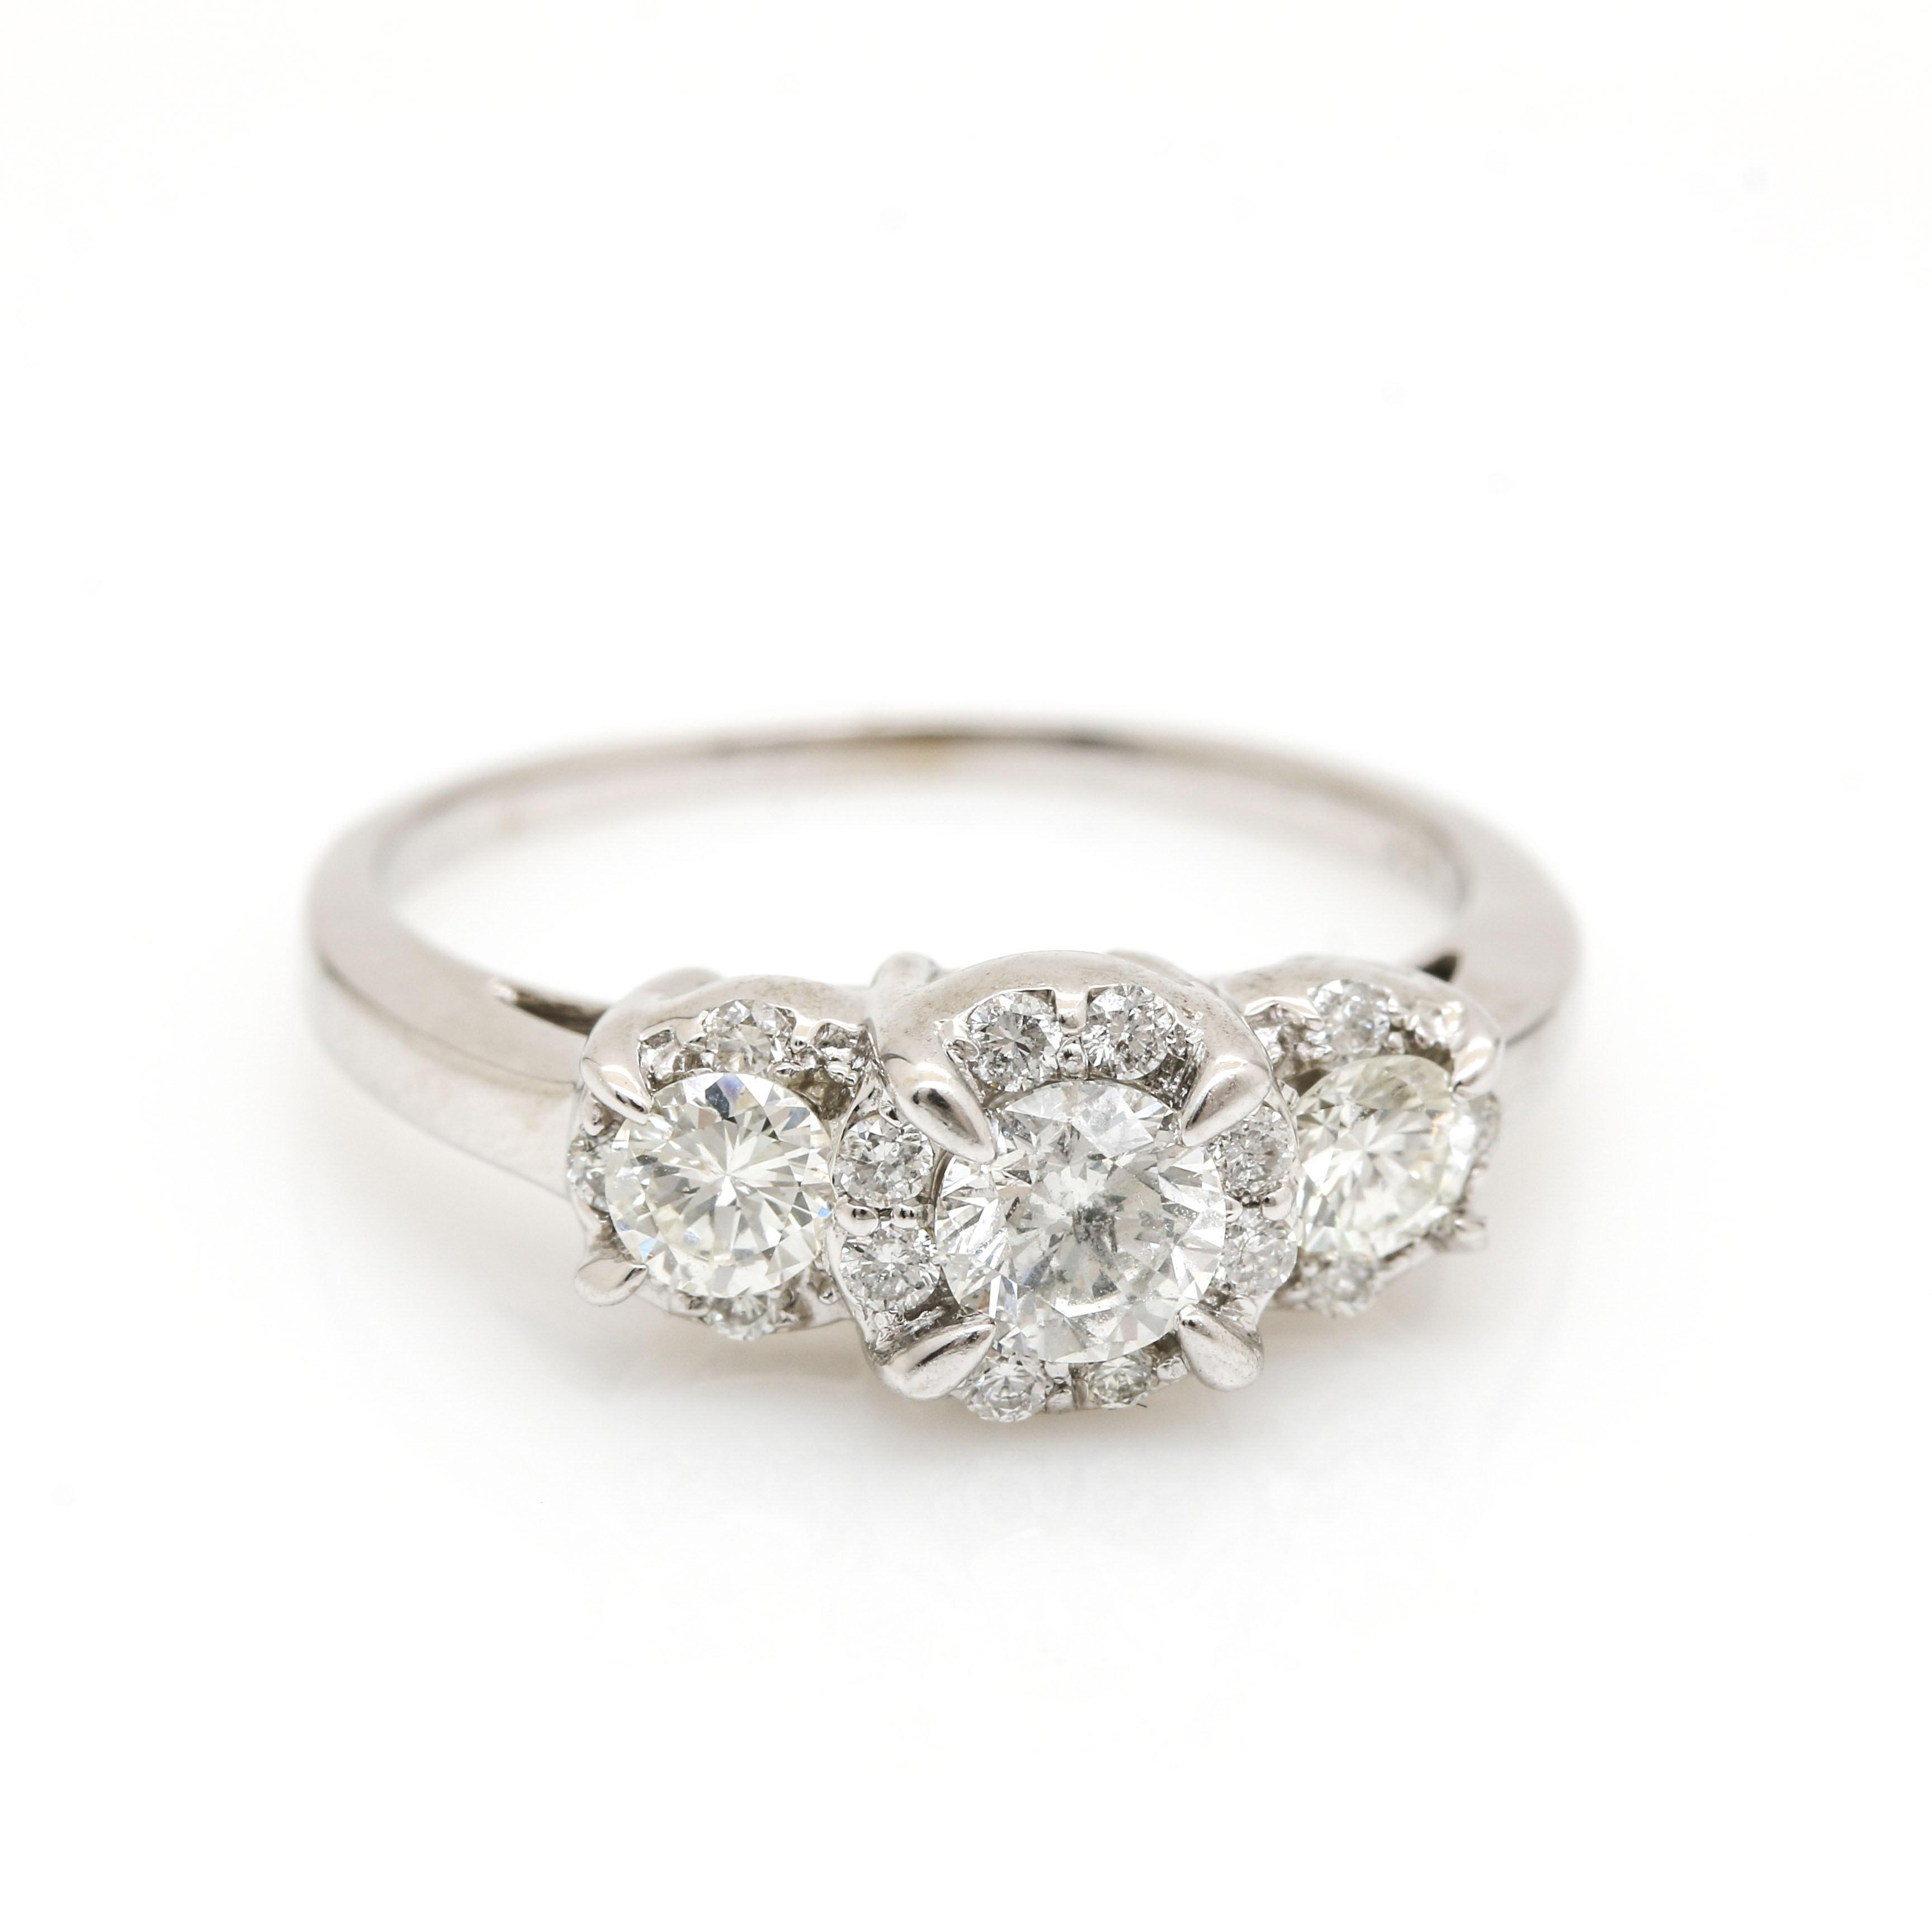 14K White Gold 0.88 CTW Diamond Ring